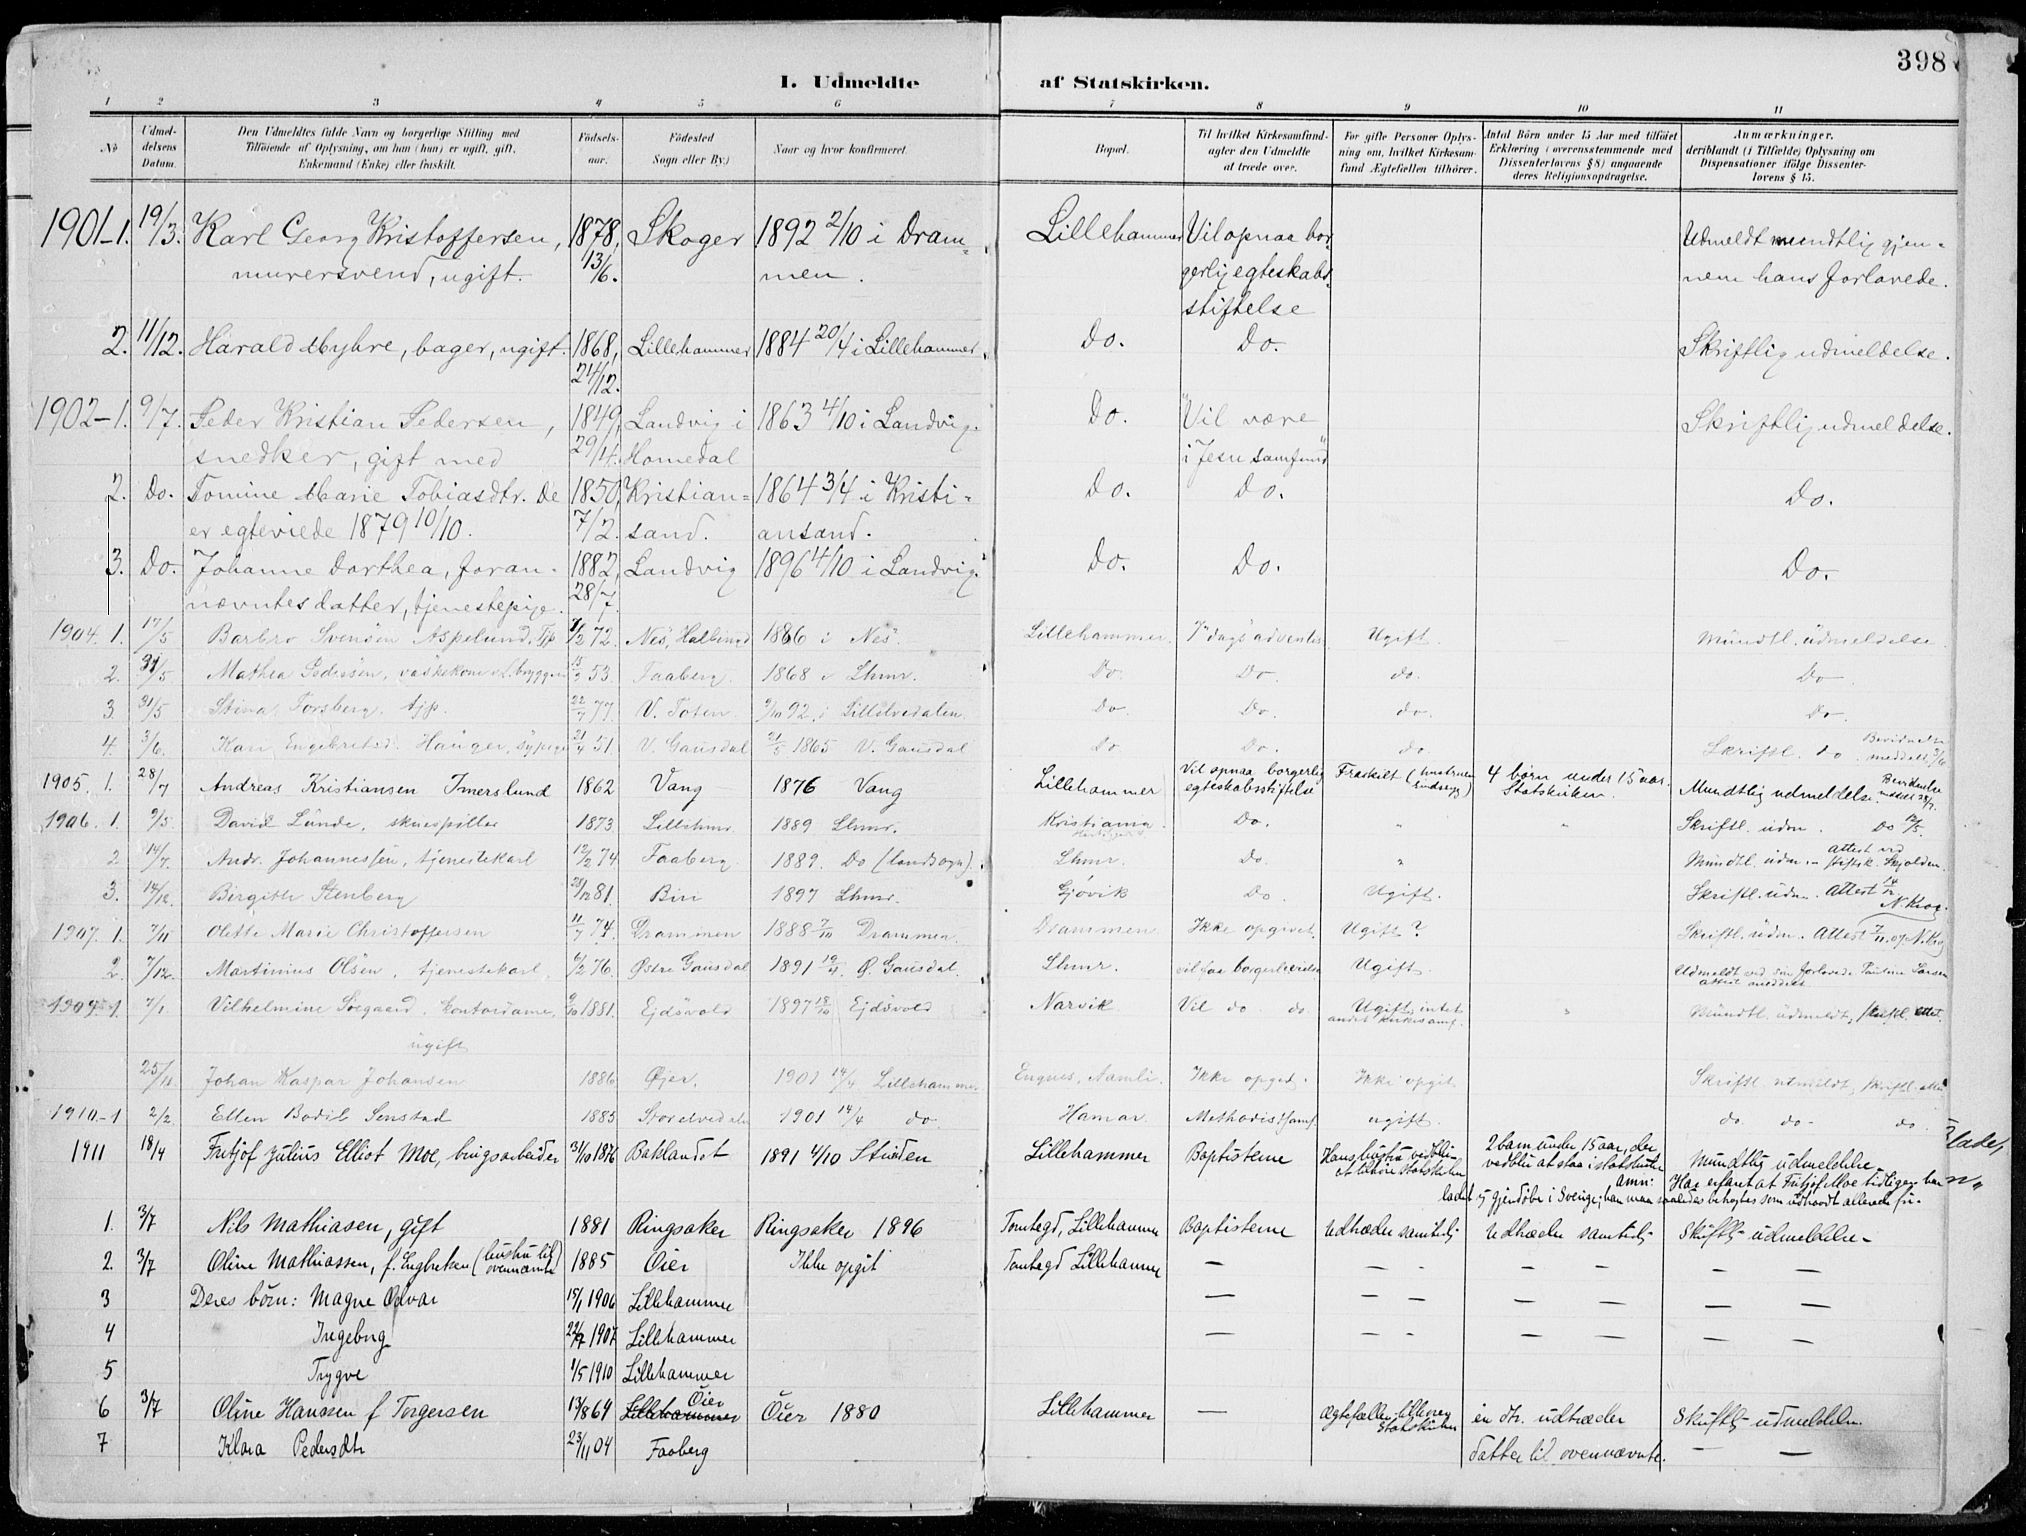 SAH, Lillehammer prestekontor, Ministerialbok nr. 1, 1901-1916, s. 398